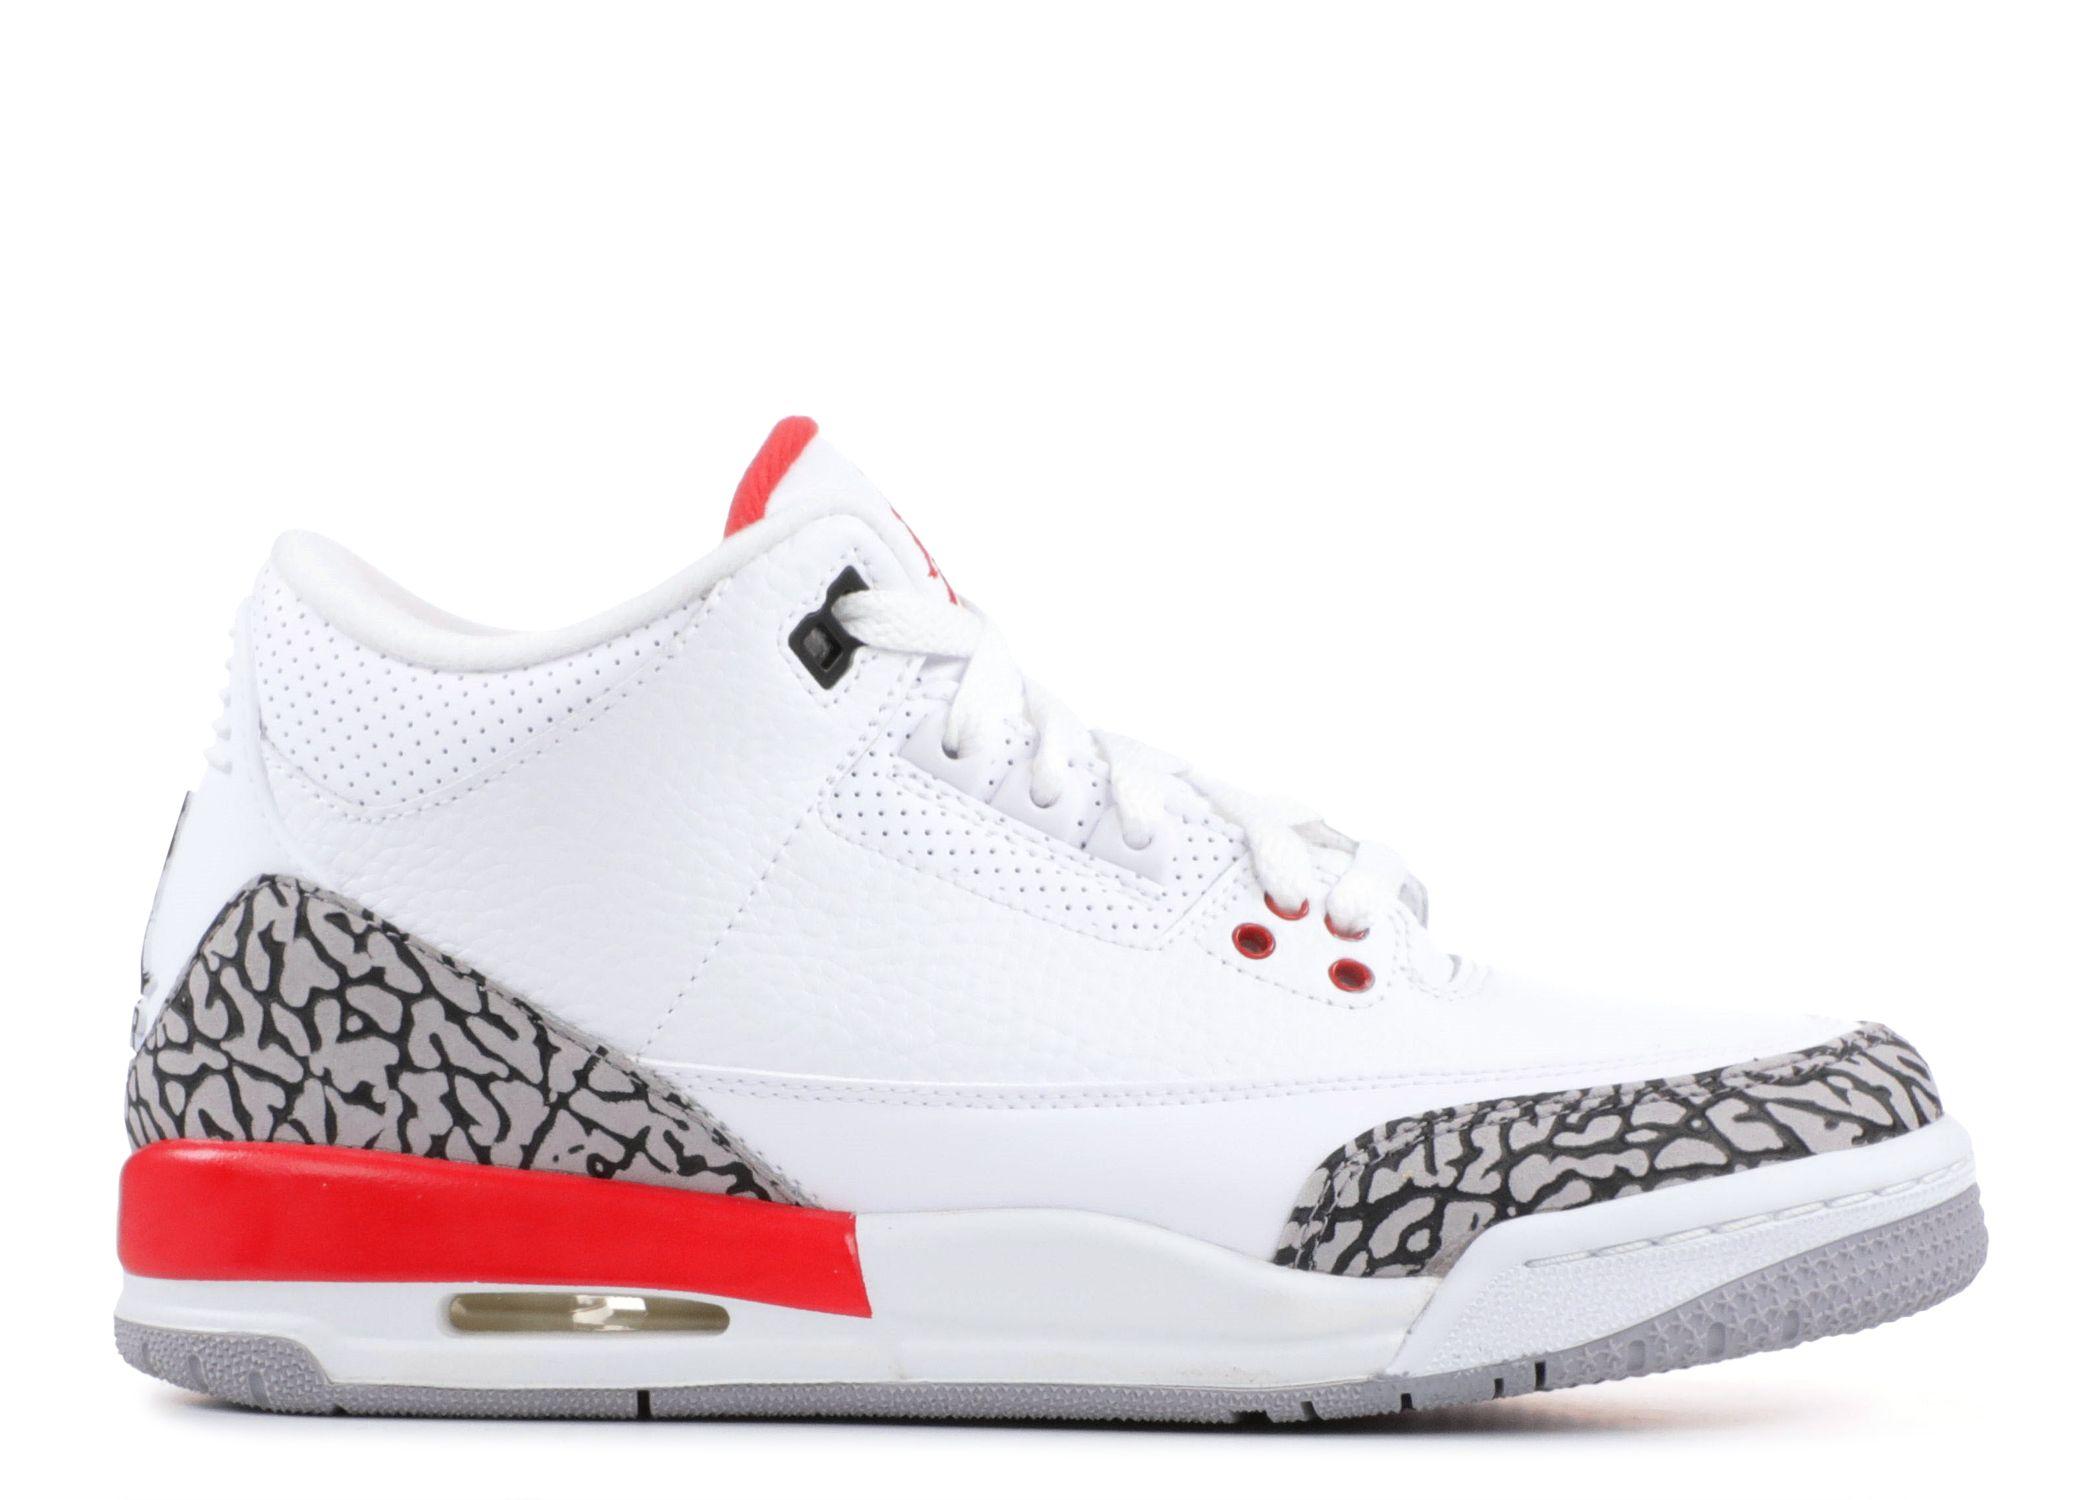 huge selection of 4325e 9e256 Jordan Shoes For Men, Air Jordan Shoes, Flight Club, Nike High Tops,